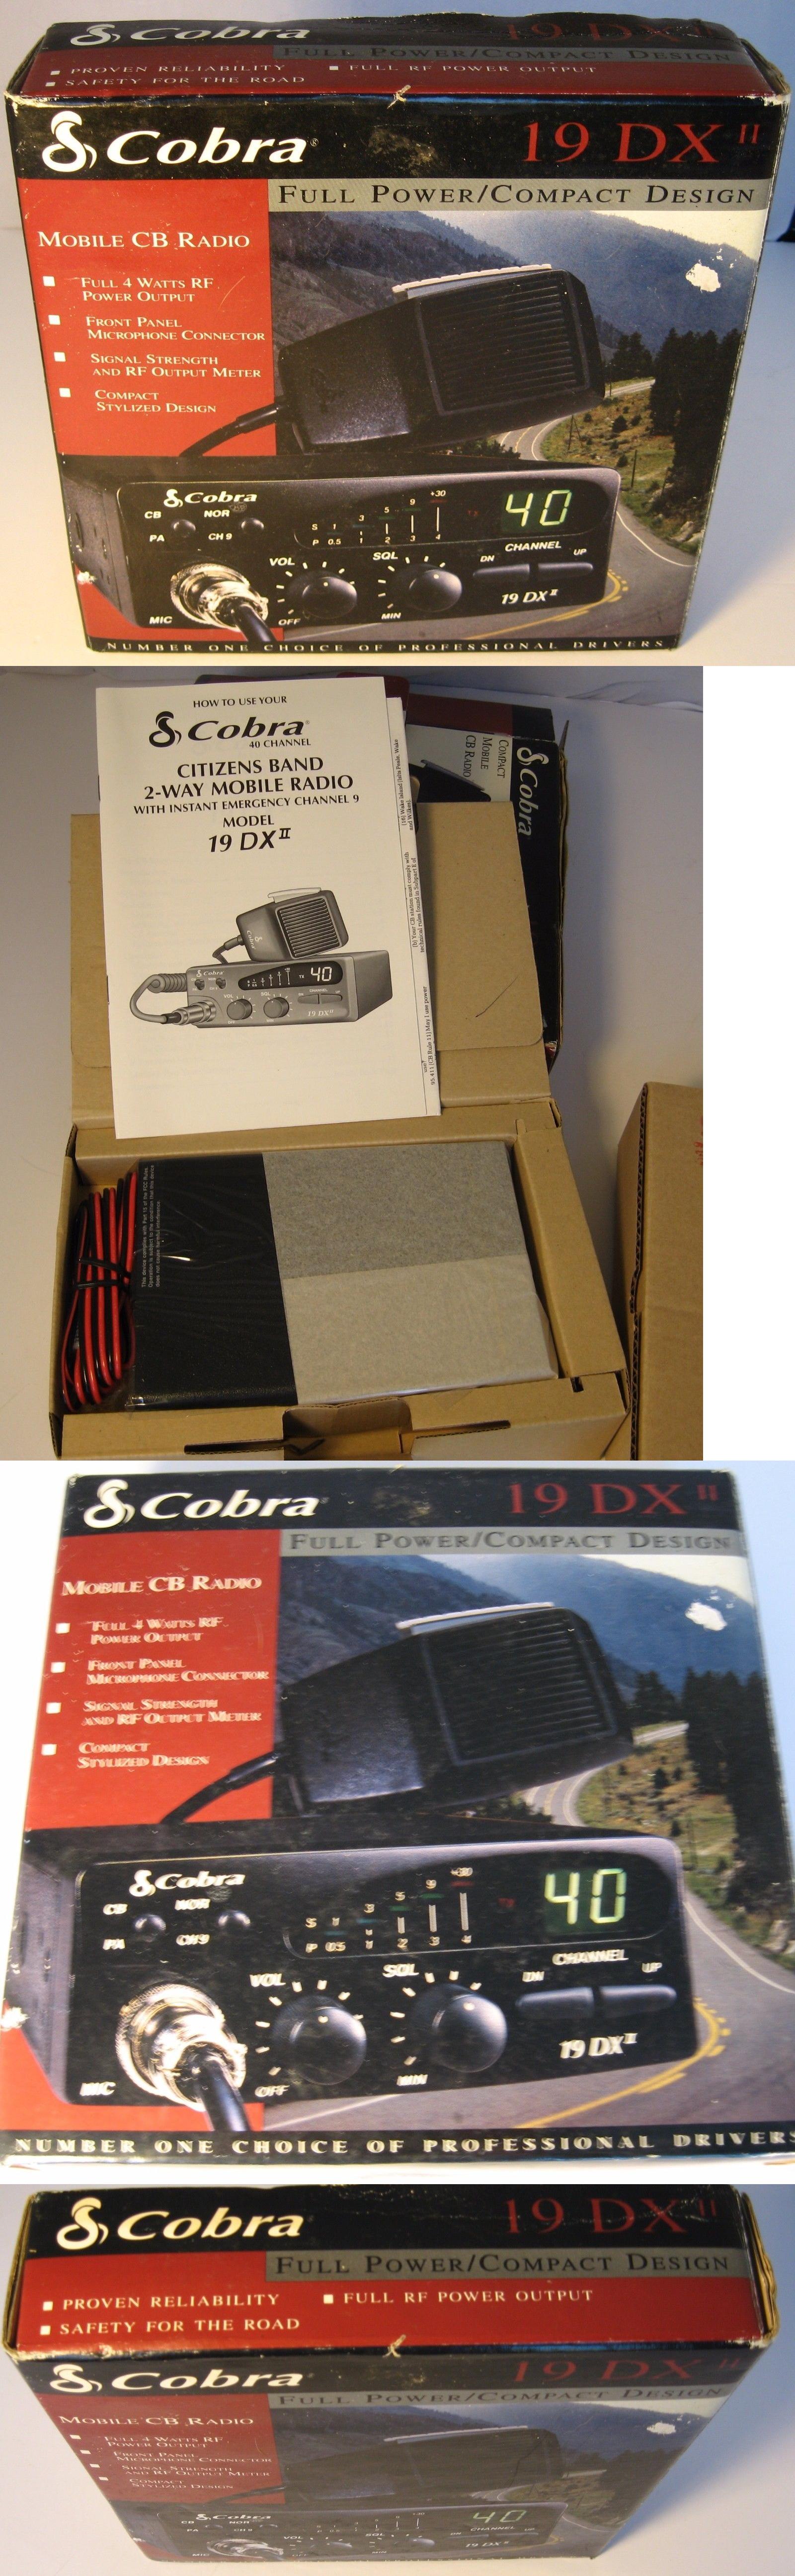 Cb radios cobra 19 dx ii cb radio with mic in box never used cb radios cobra 19 dx ii cb radio with mic in box never used sciox Gallery